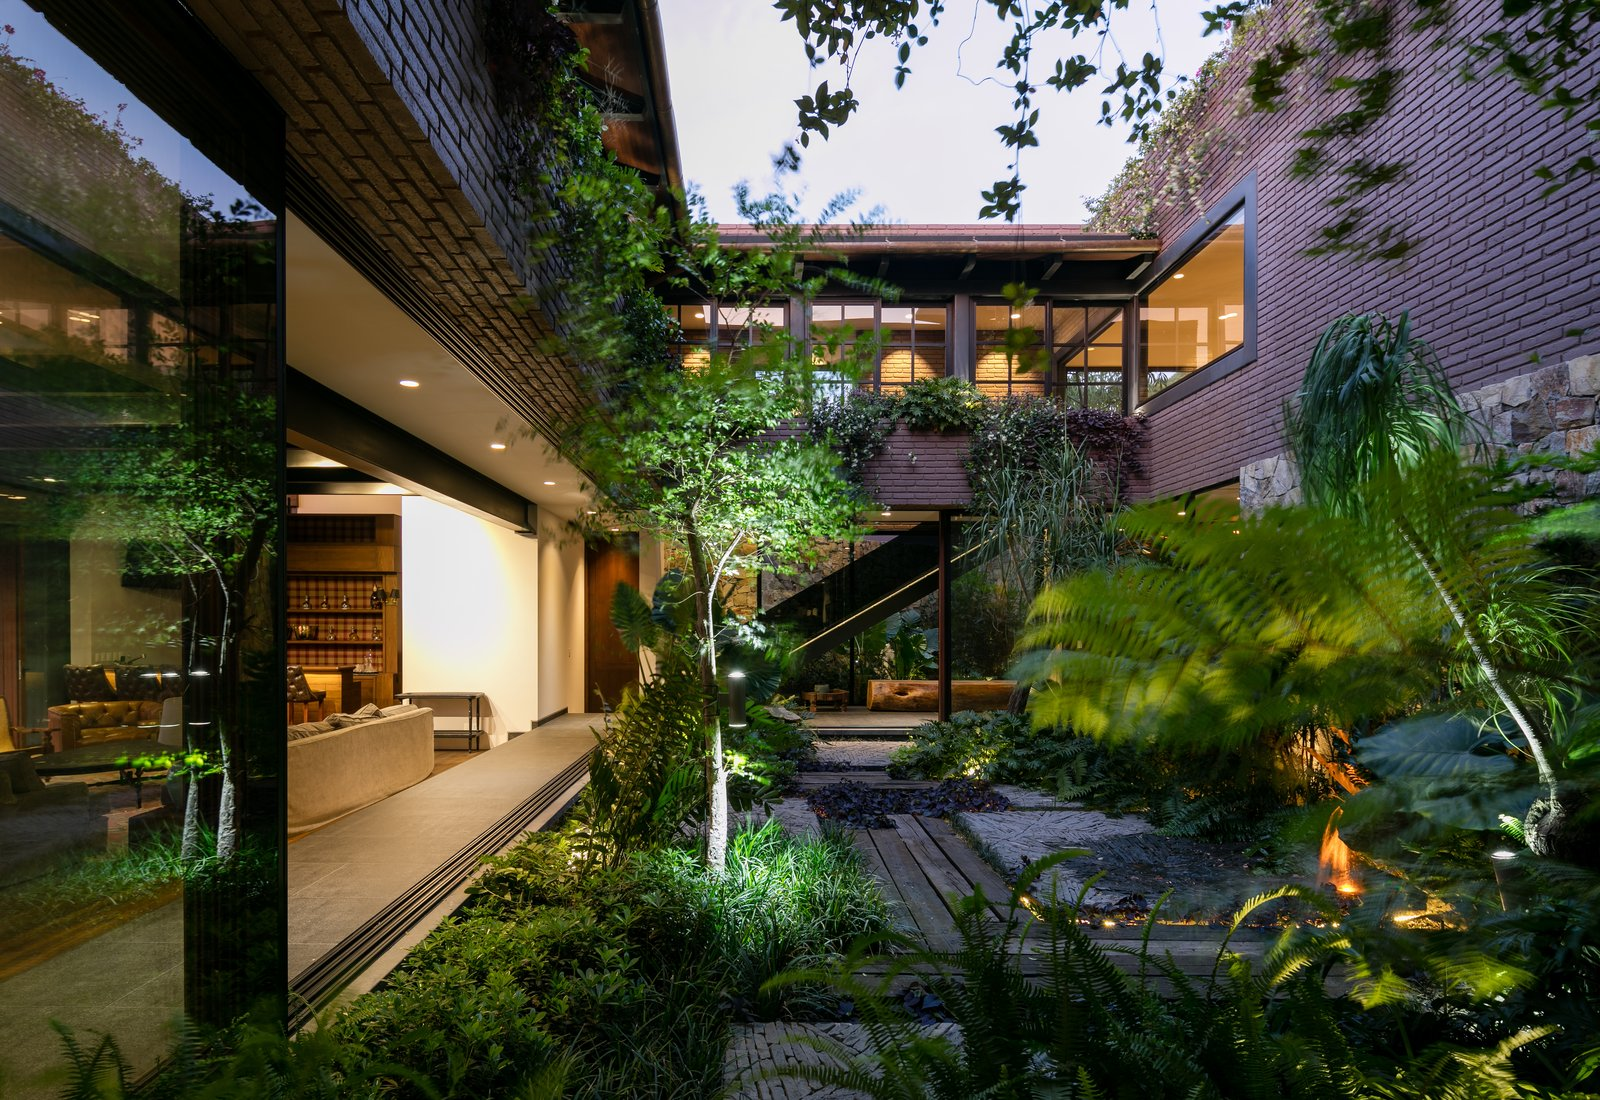 Tagged: Outdoor, Trees, Walkways, Gardens, Decking Patio, Porch, Deck, Side Yard, and Garden.  Casa OM1 by Santiago Rivero